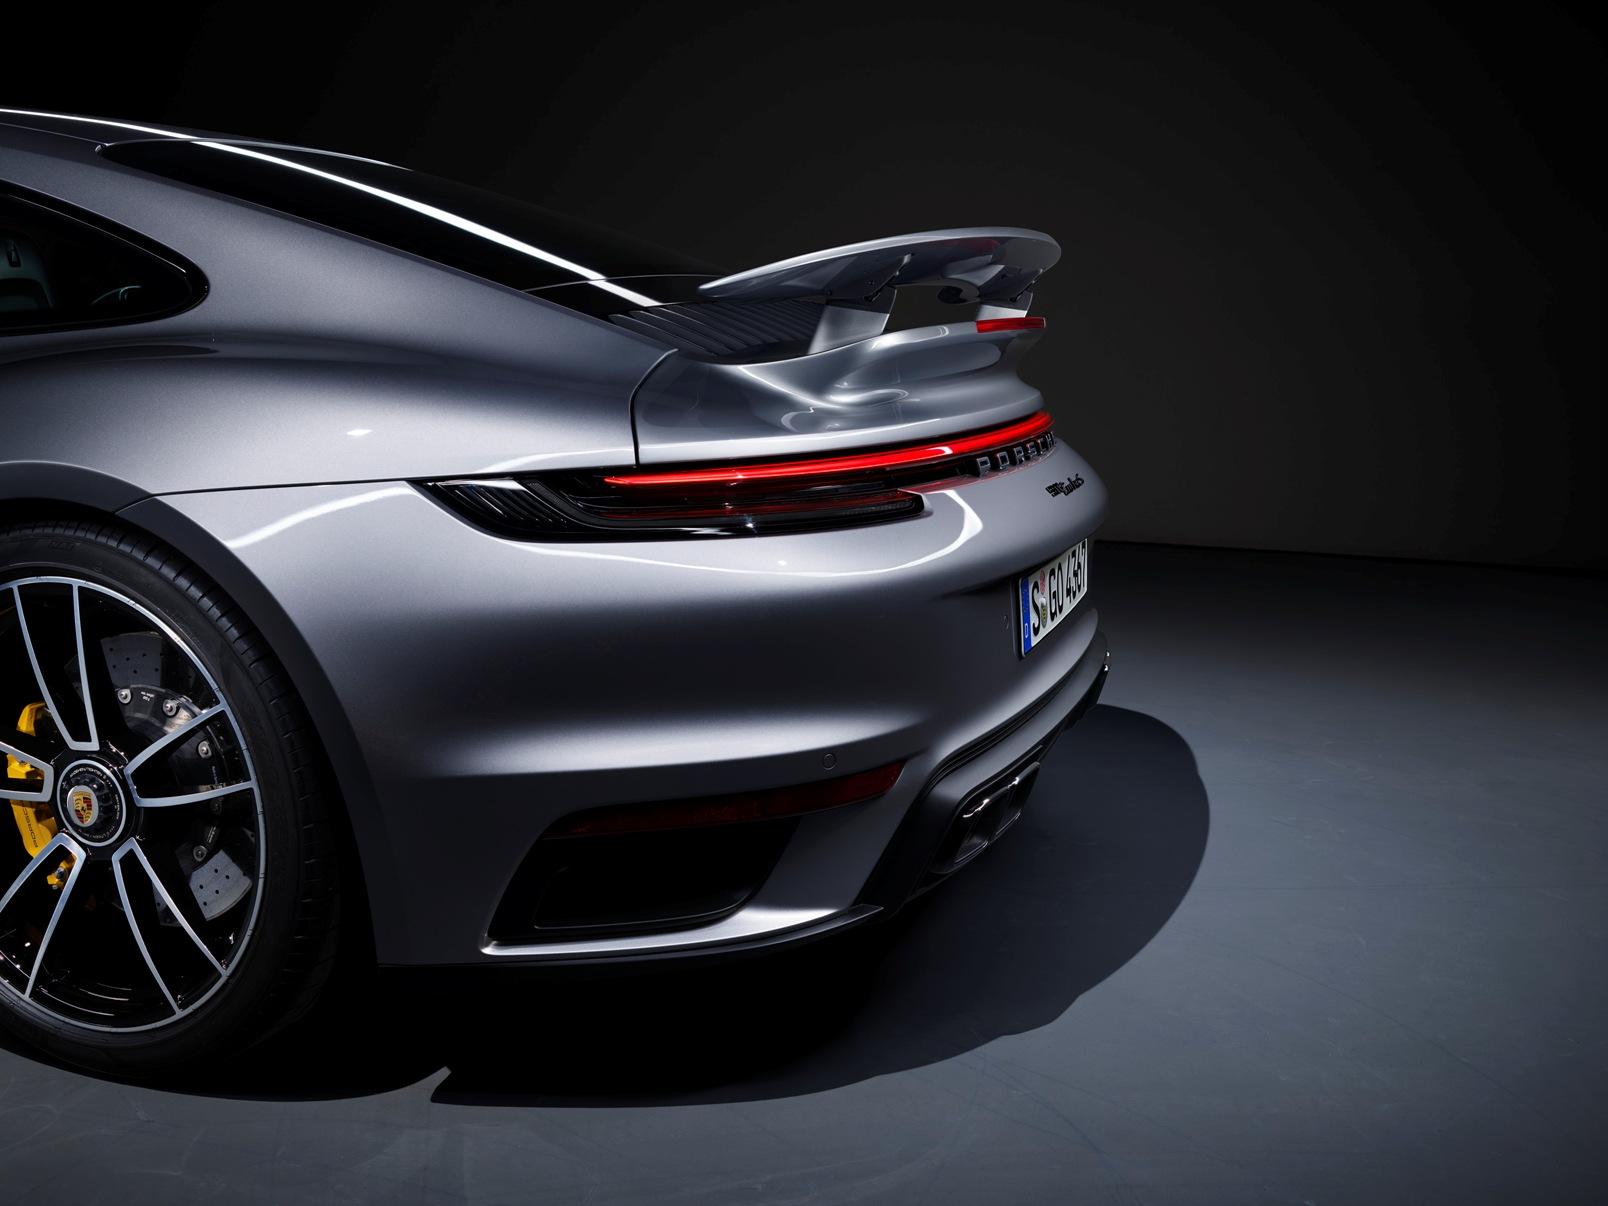 Aerodinámica Porsche 911 Turbo S (13)